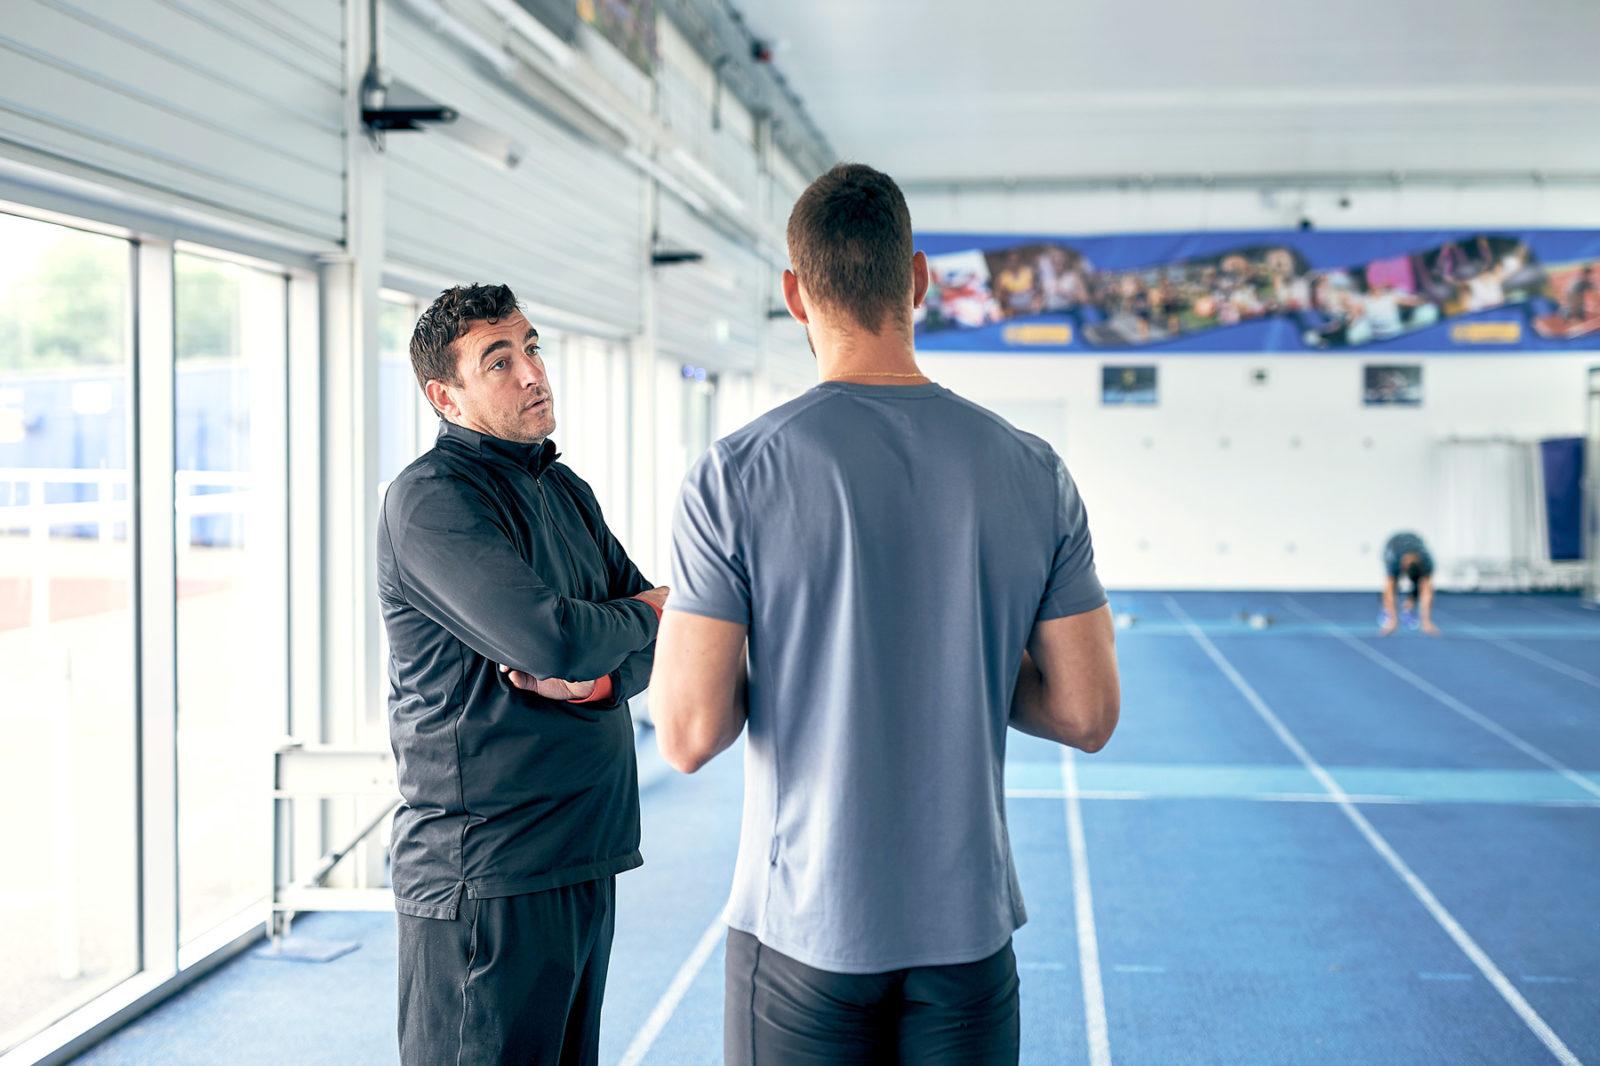 KINEXON Sports General Two Men Talking In Gym Getty Images 1129095502 edited website header